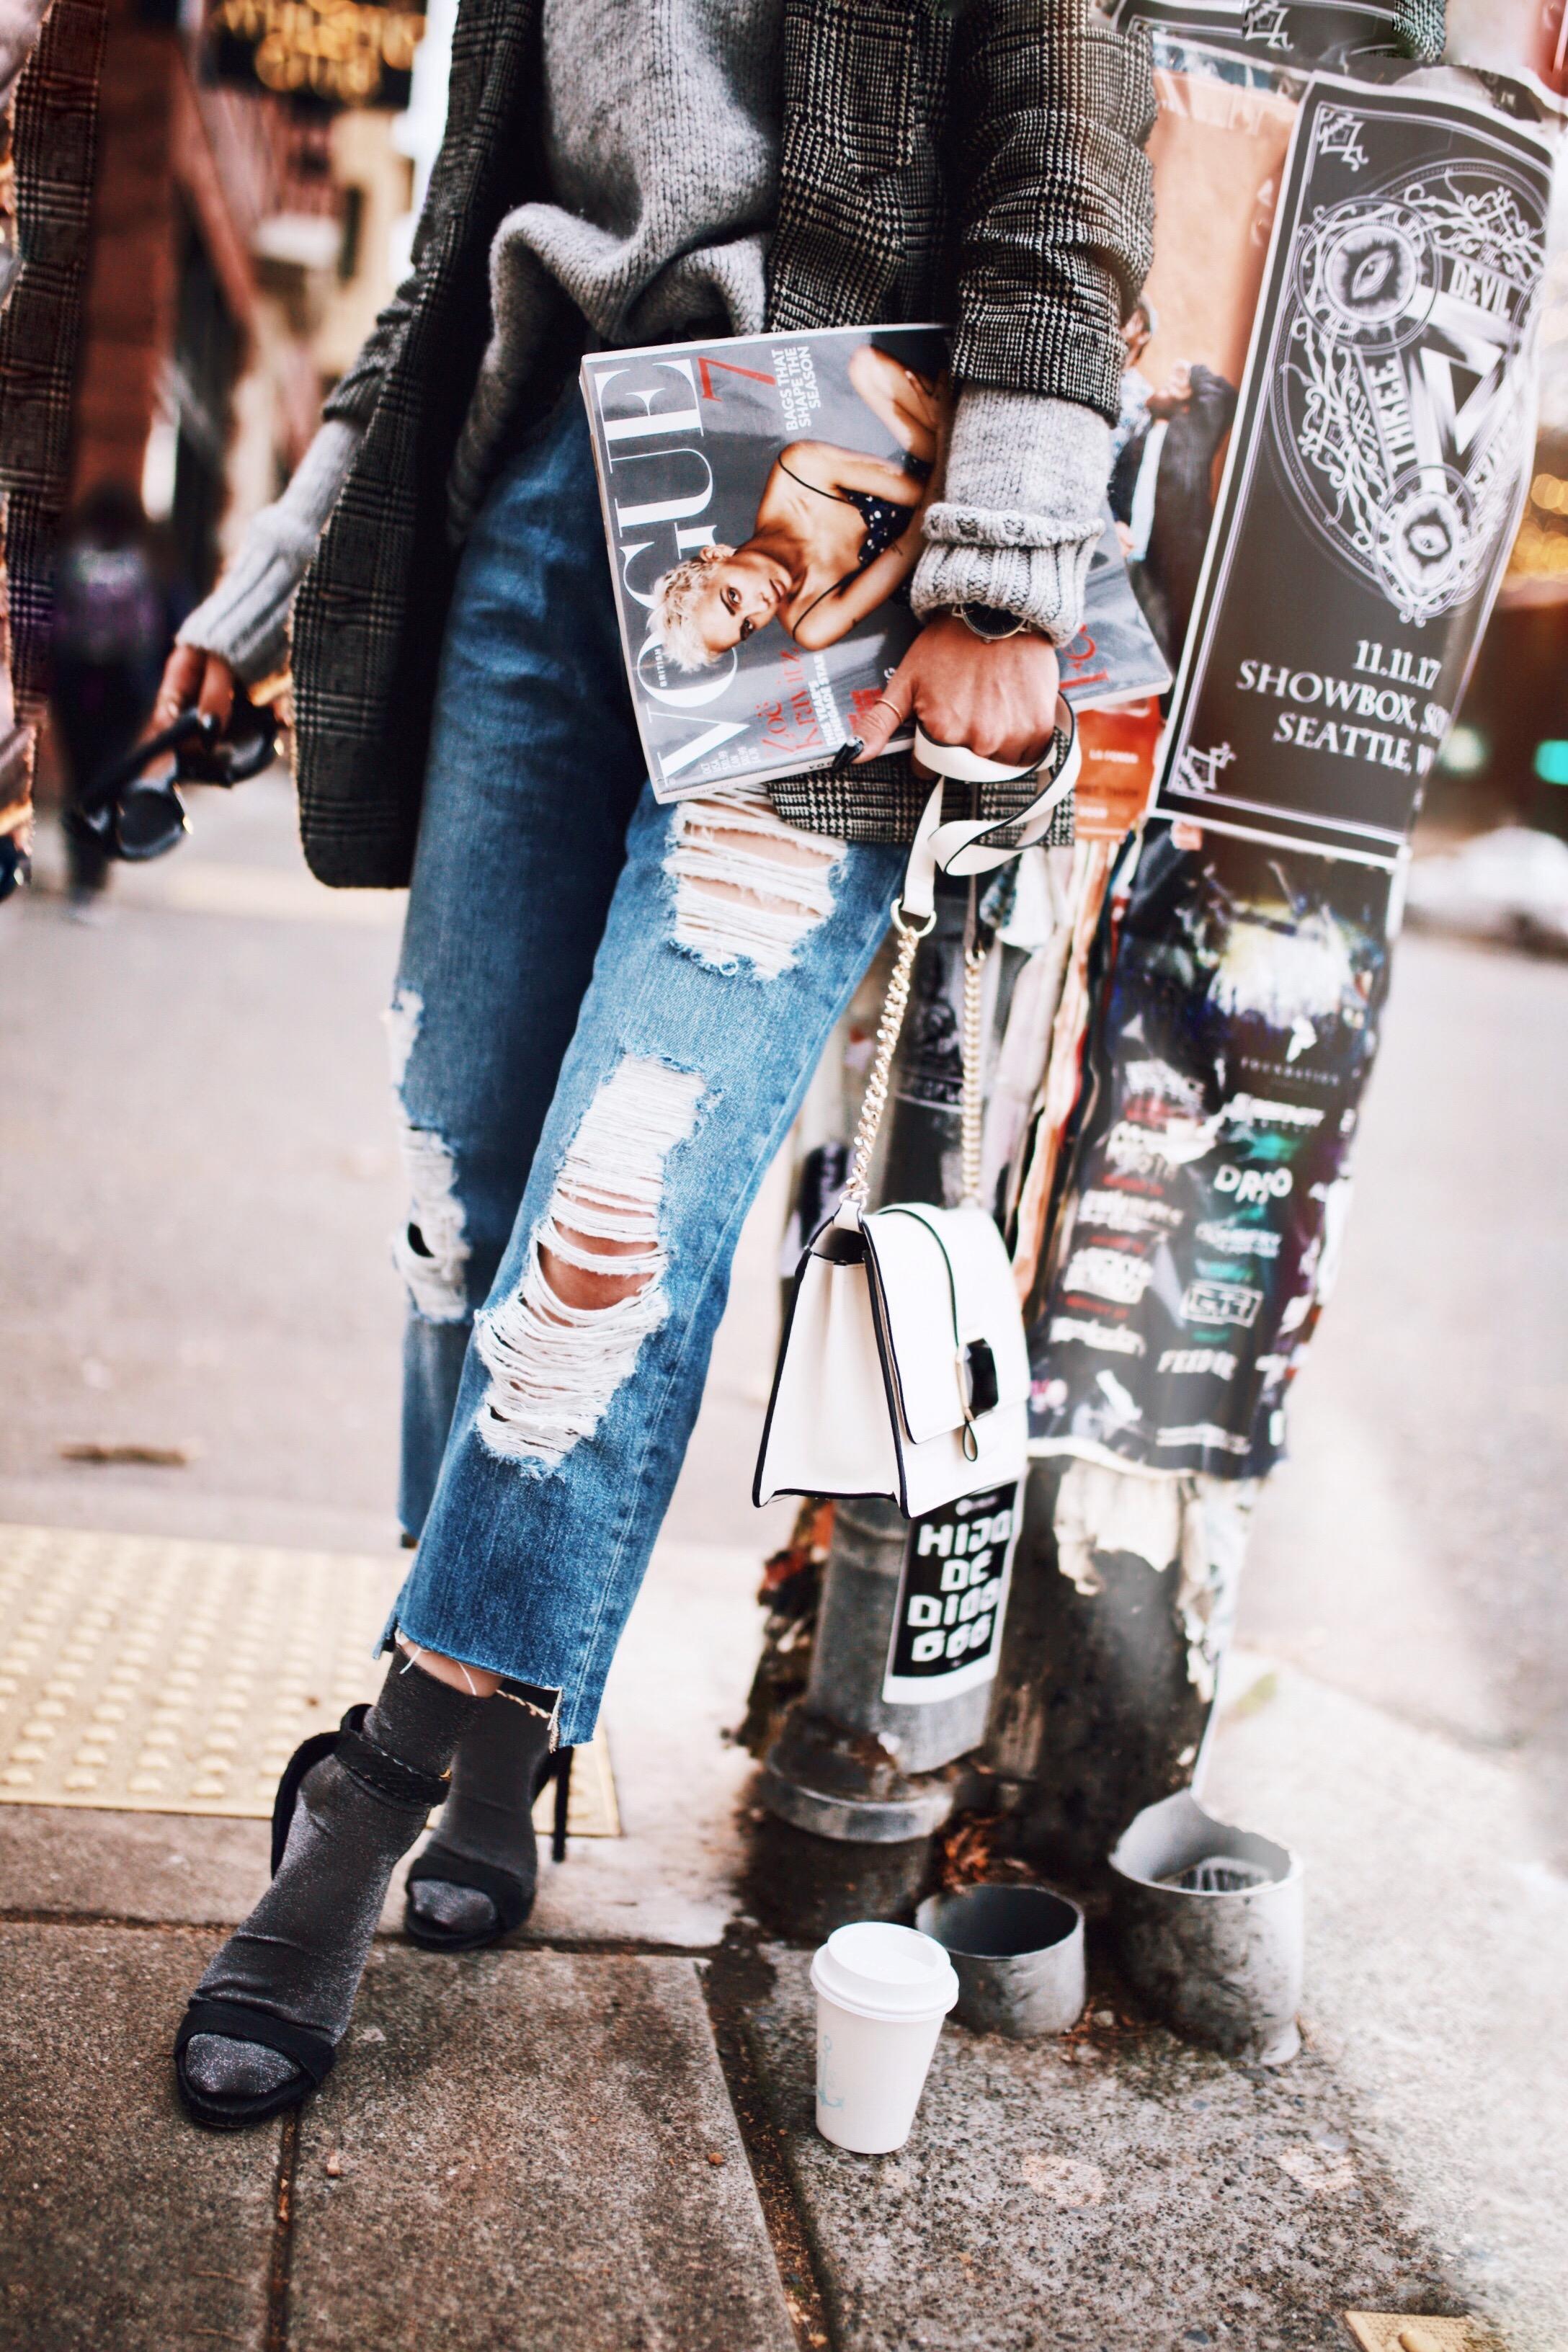 Kapten and Son watch-Zara Gray Turtleneck Sweater-Nordstrom Checked Blazer-ASOS Distressed frayed hem jeans-NAIGAI Glitter Ankle Socks-Black scrappy sandals-H&M White Crossbody Bag-Aritzia Fisherman Hat-Aika's Love Closet-Seattle fashion style blogger-pink hair-Japanese 15